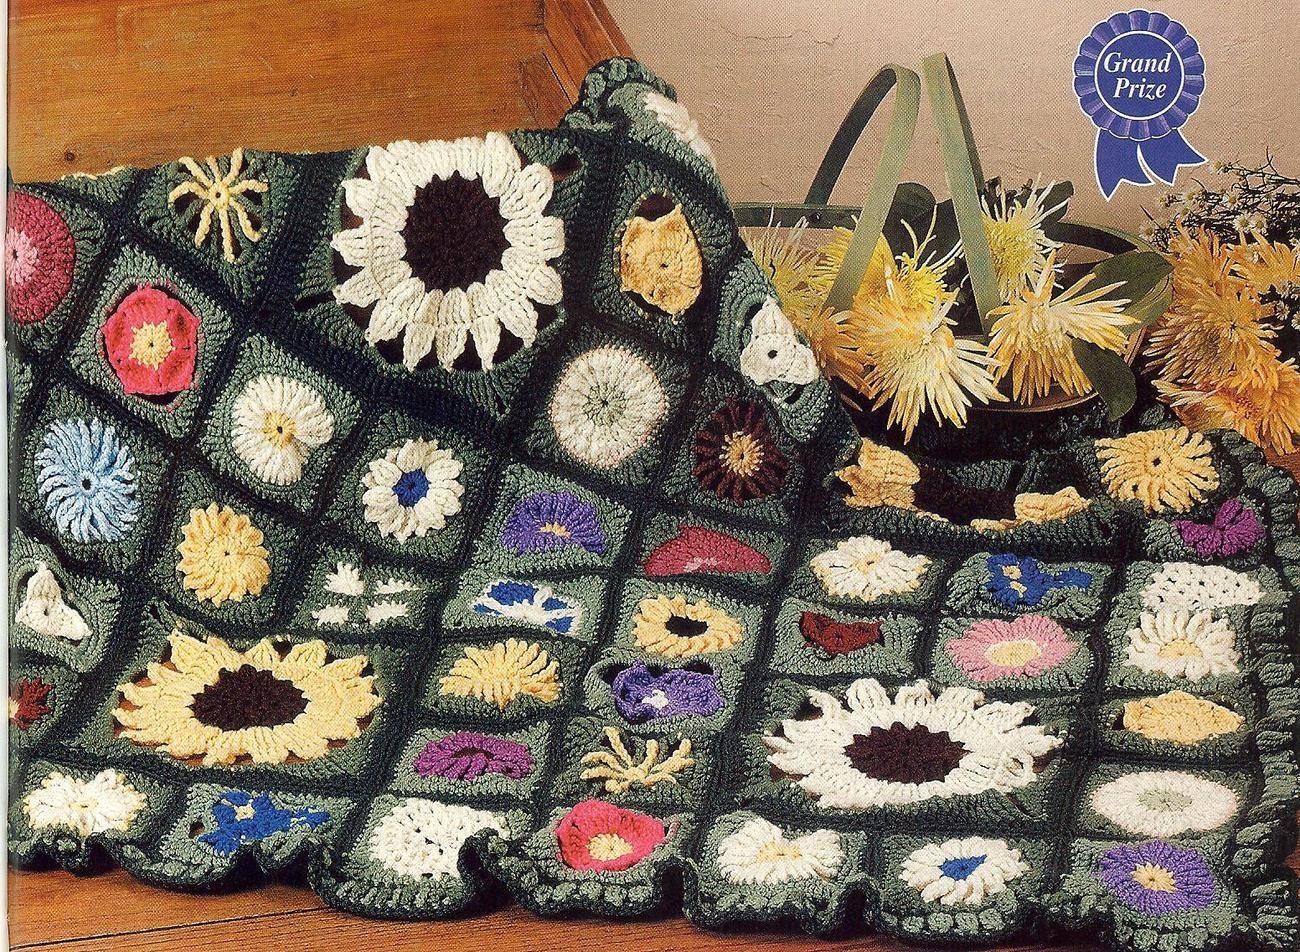 Award winning field of flowers crochet afghan pattern crochet crochet flower square afghan patterns award winning field of flowers crochet afghan pattern afghans dt1010fo